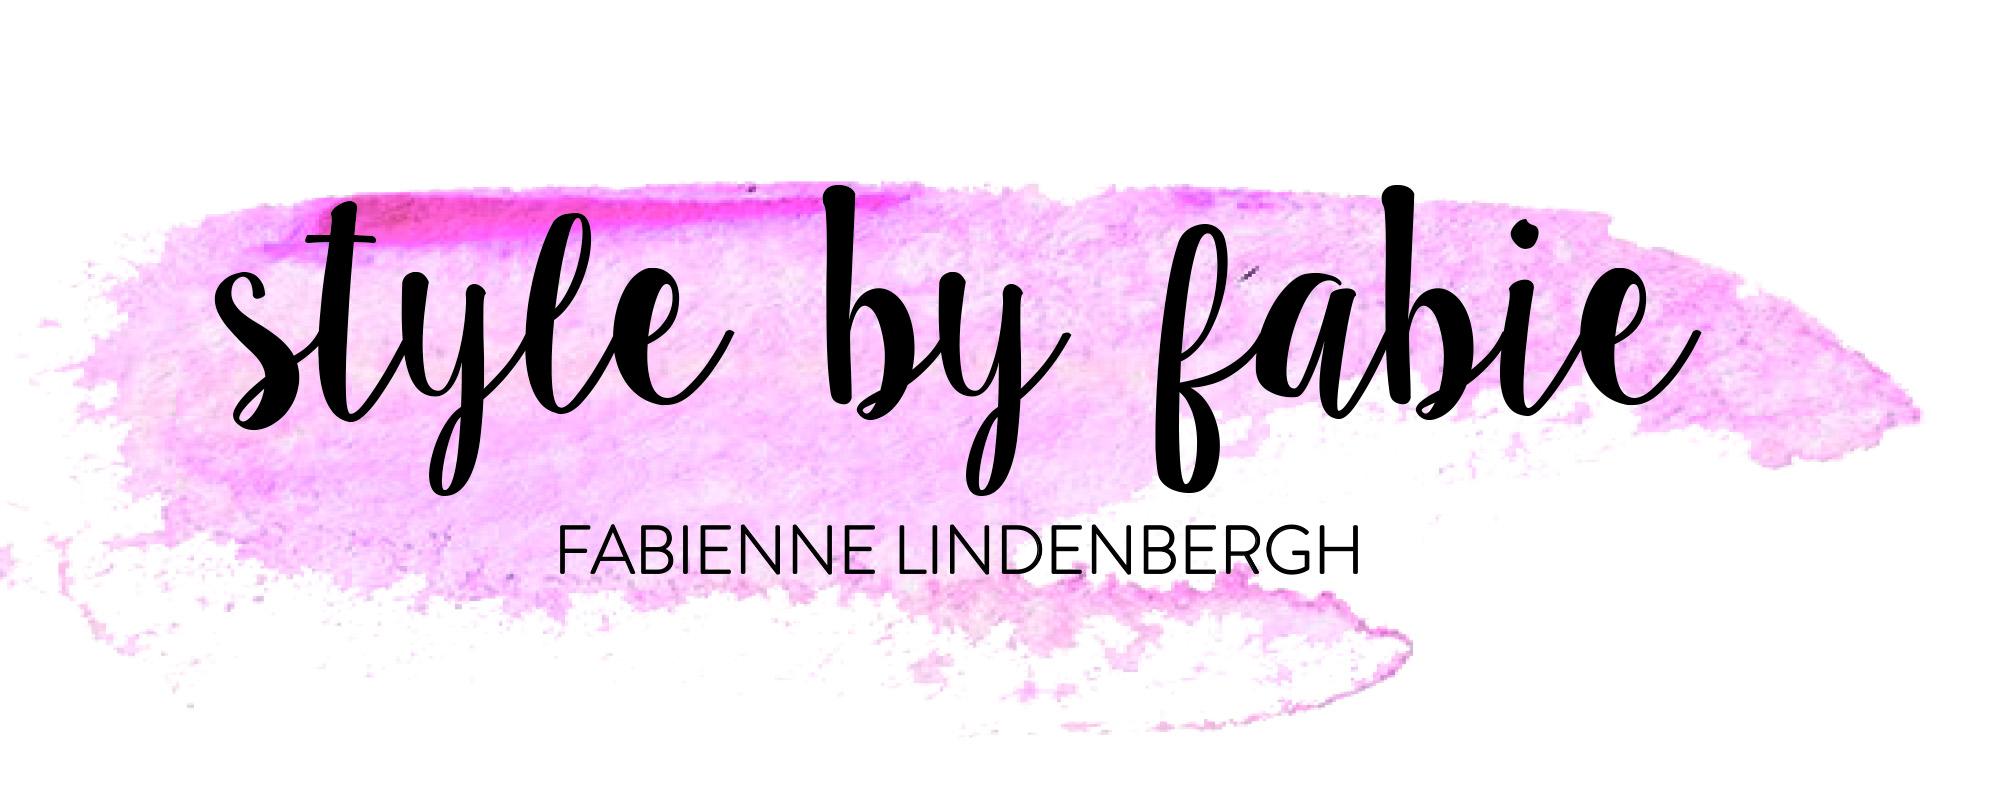 STYLEBYFABIE.COM - Fabienne Lindenbergh